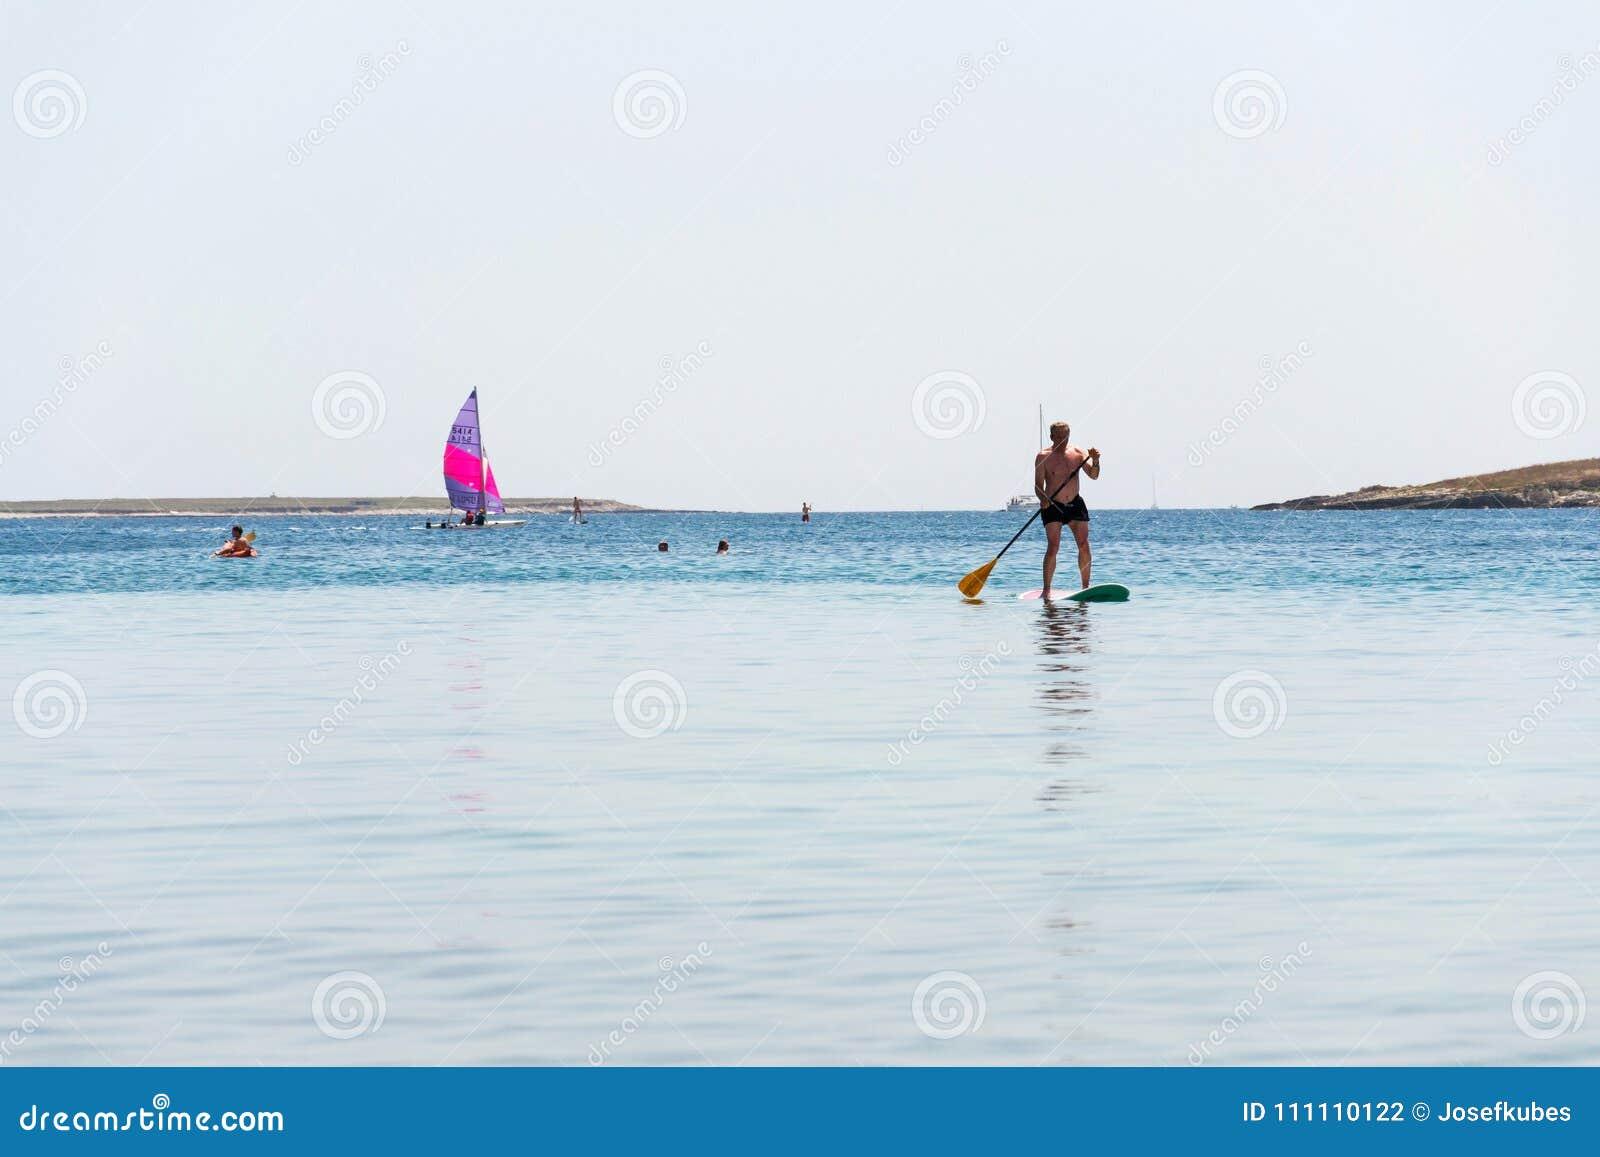 Tourists windsurfing and paddleboarding around Kamenjak peninsula by the Adriatic Sea in Premantura, Croatia